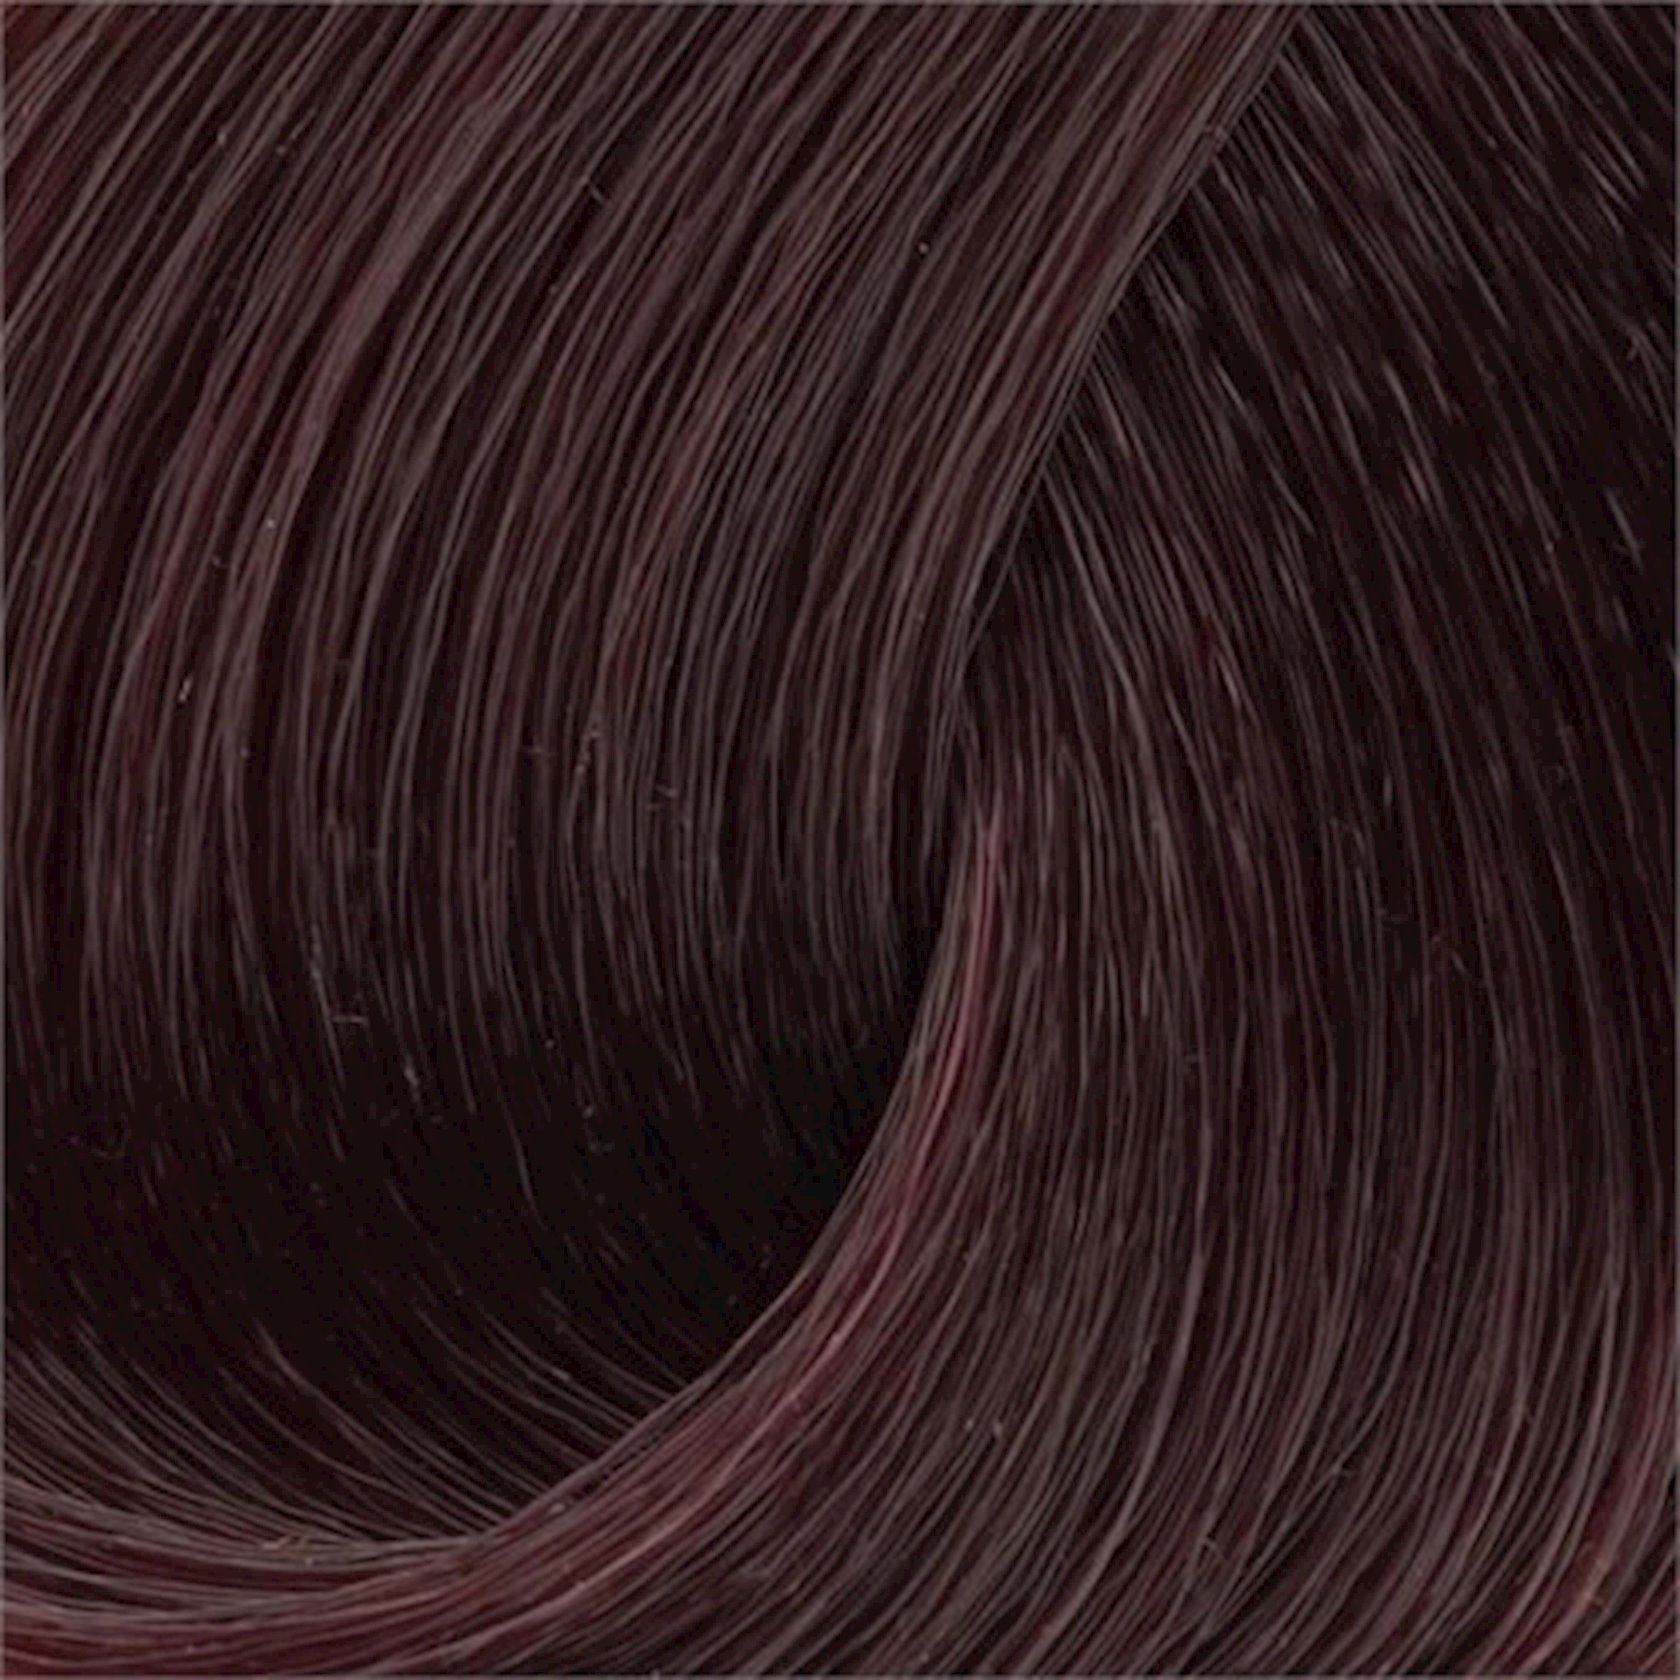 Saç üçün qalıcı krem boya Exicolor Permanent Hair Color Cream 100 ml №4 Kahve, Qəhvə